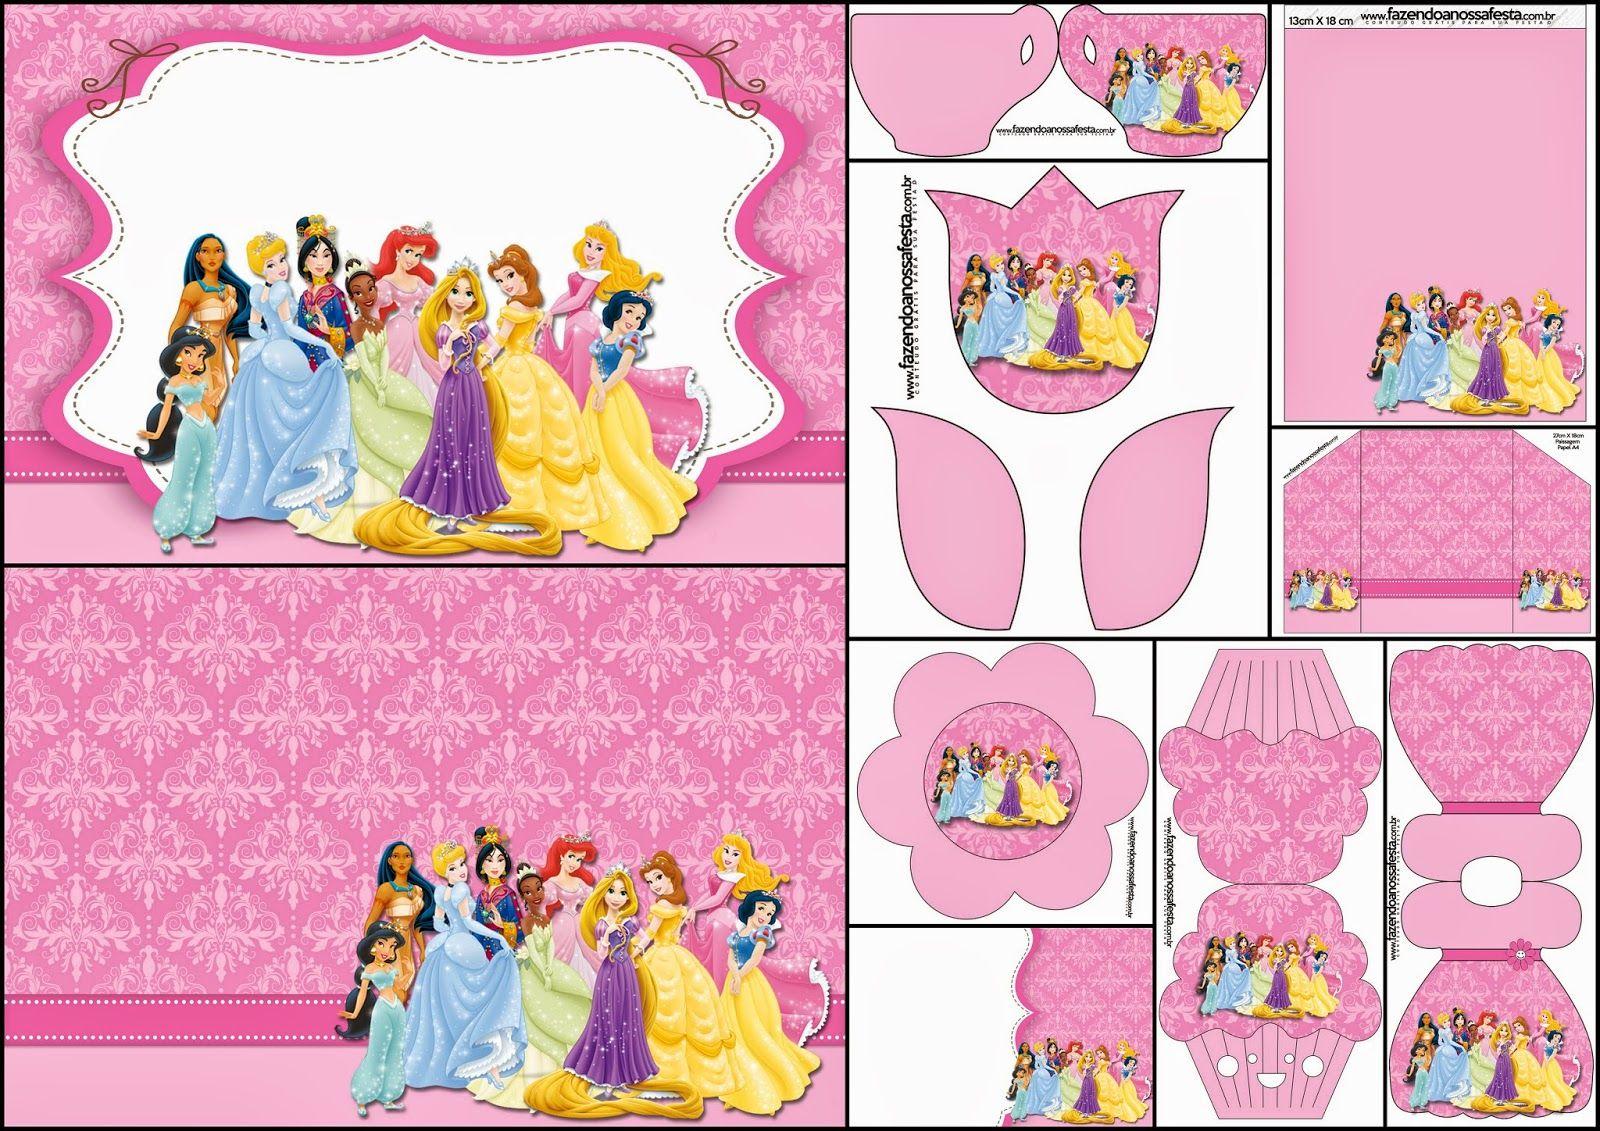 Disney Princess Pary Free Printable Party Invitations